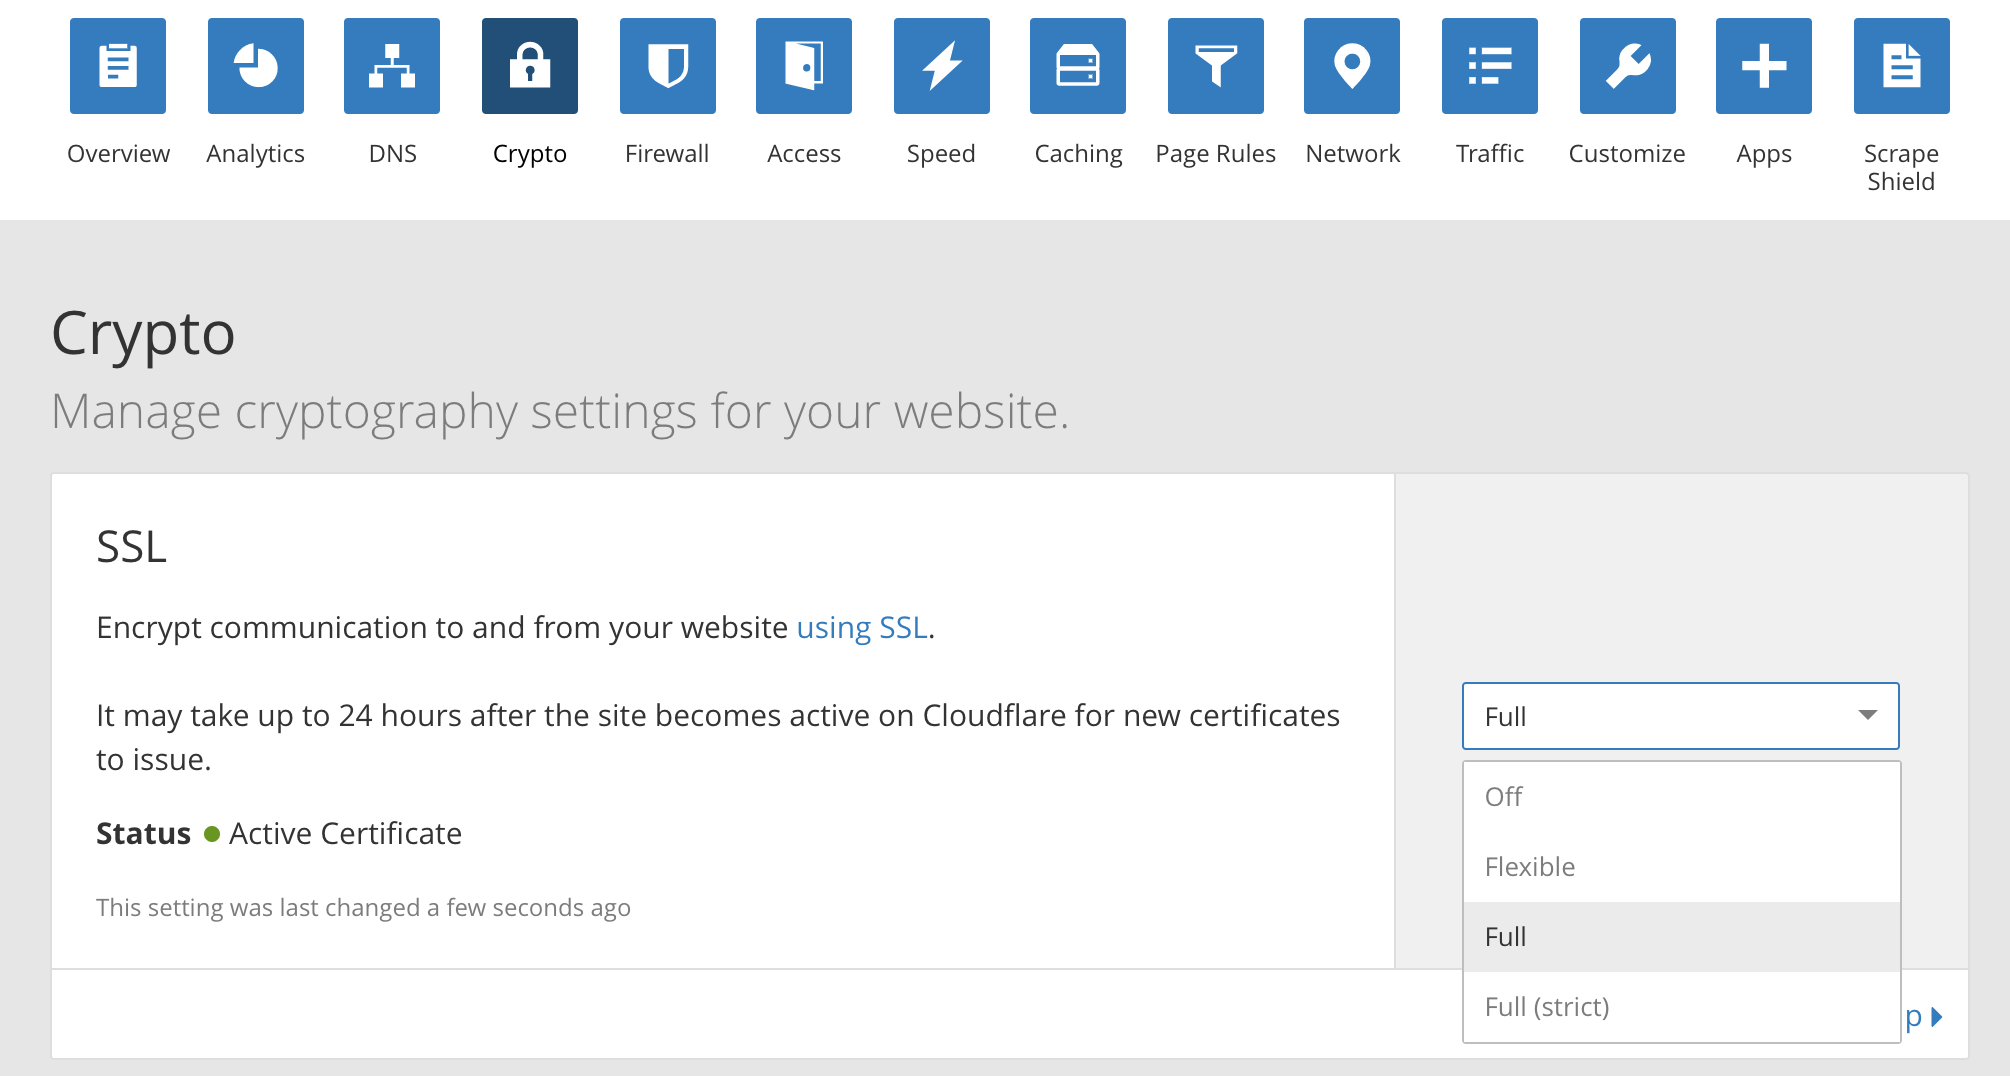 CloudFlare full crypto